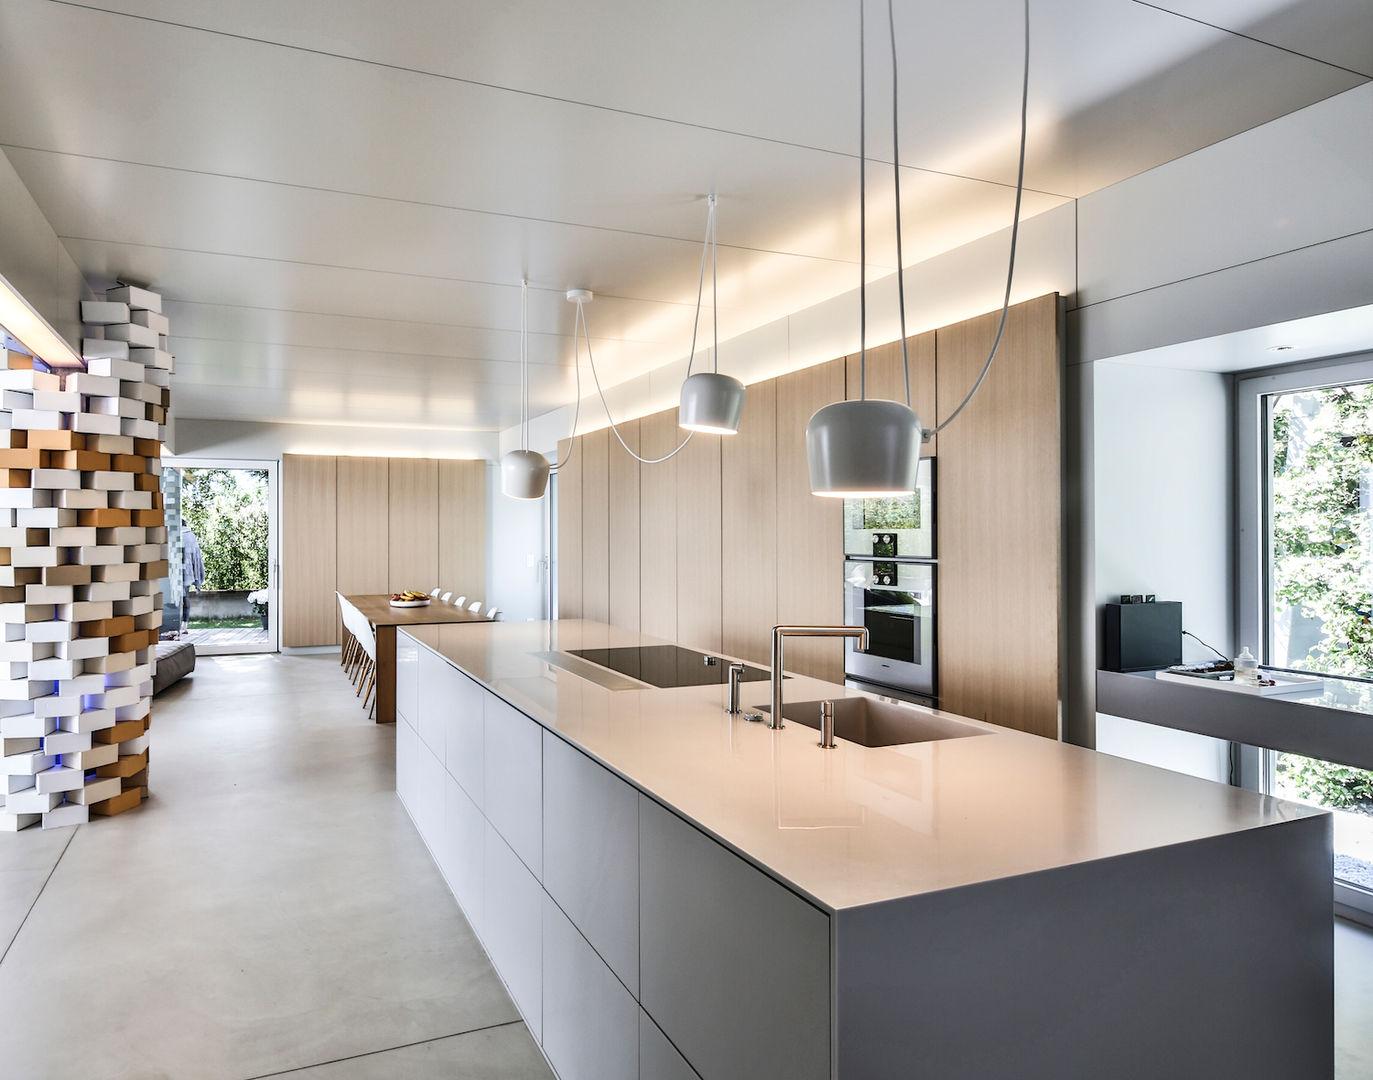 Favoloso Idee Arredamento Casa & Interior Design | homify WX22